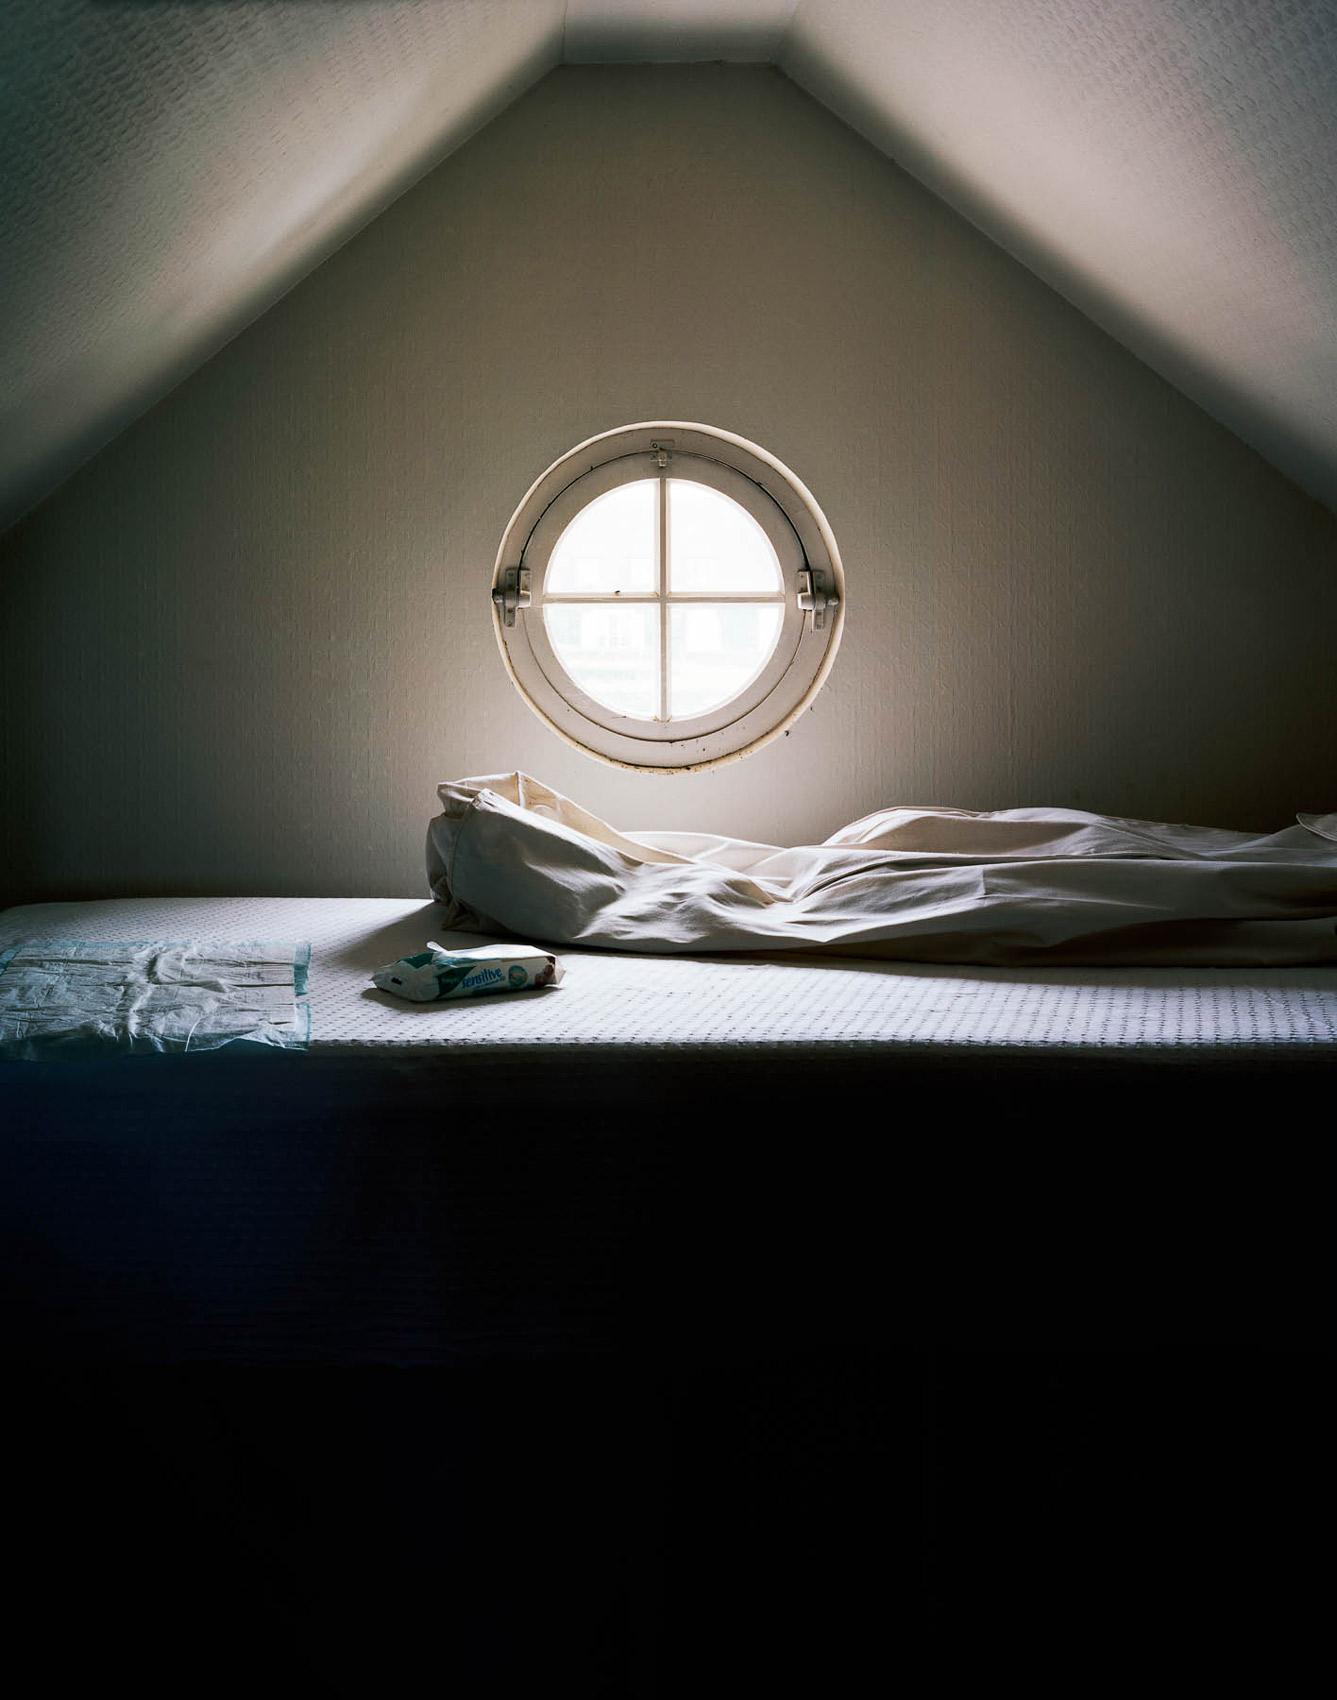 02_david_picchiottino_window_windows_fenetre-13.jpg